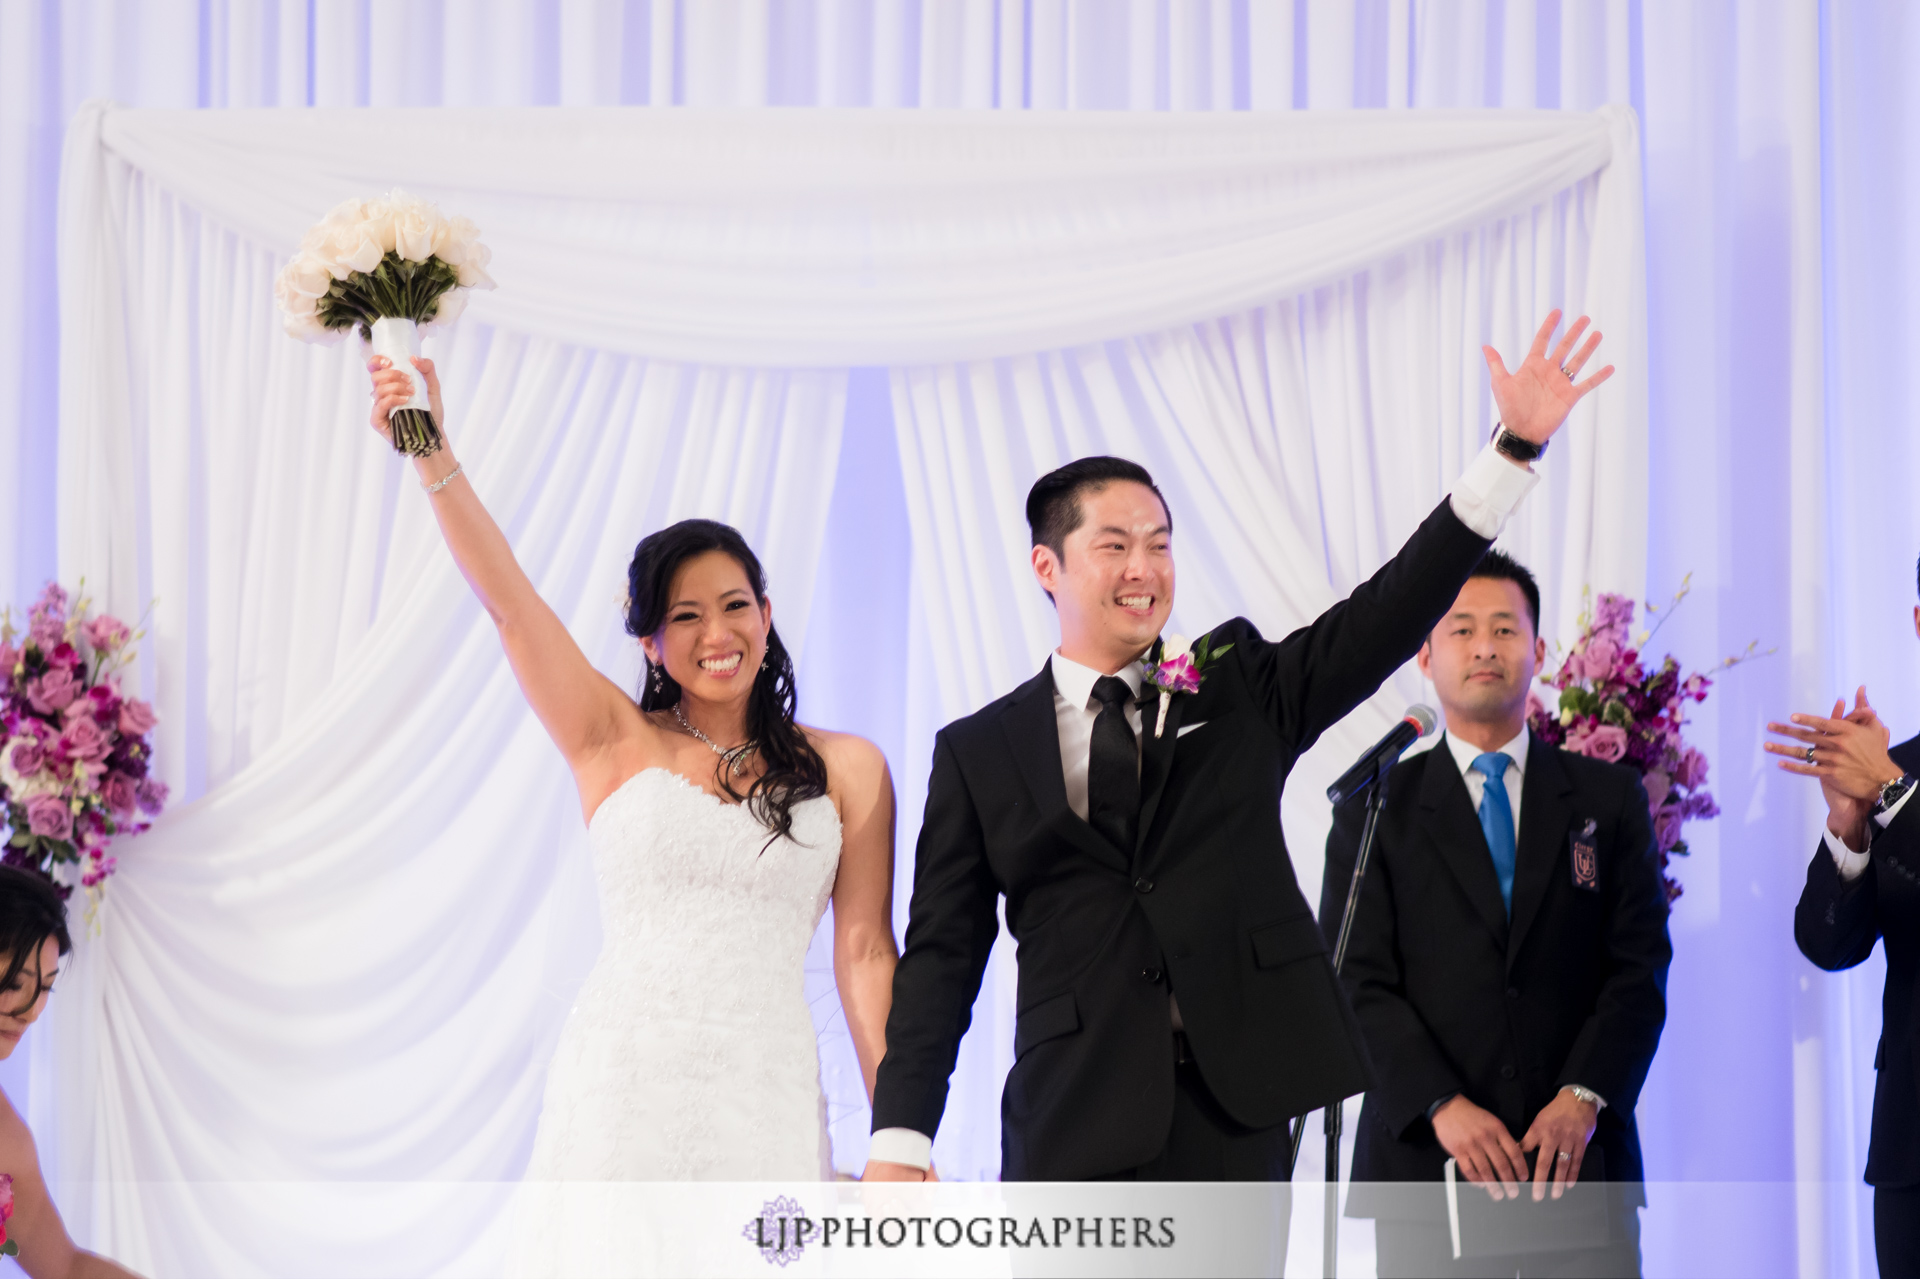 21-jw-marriott-los-angeles-wedding-photographer-wedding-ceremony-photos